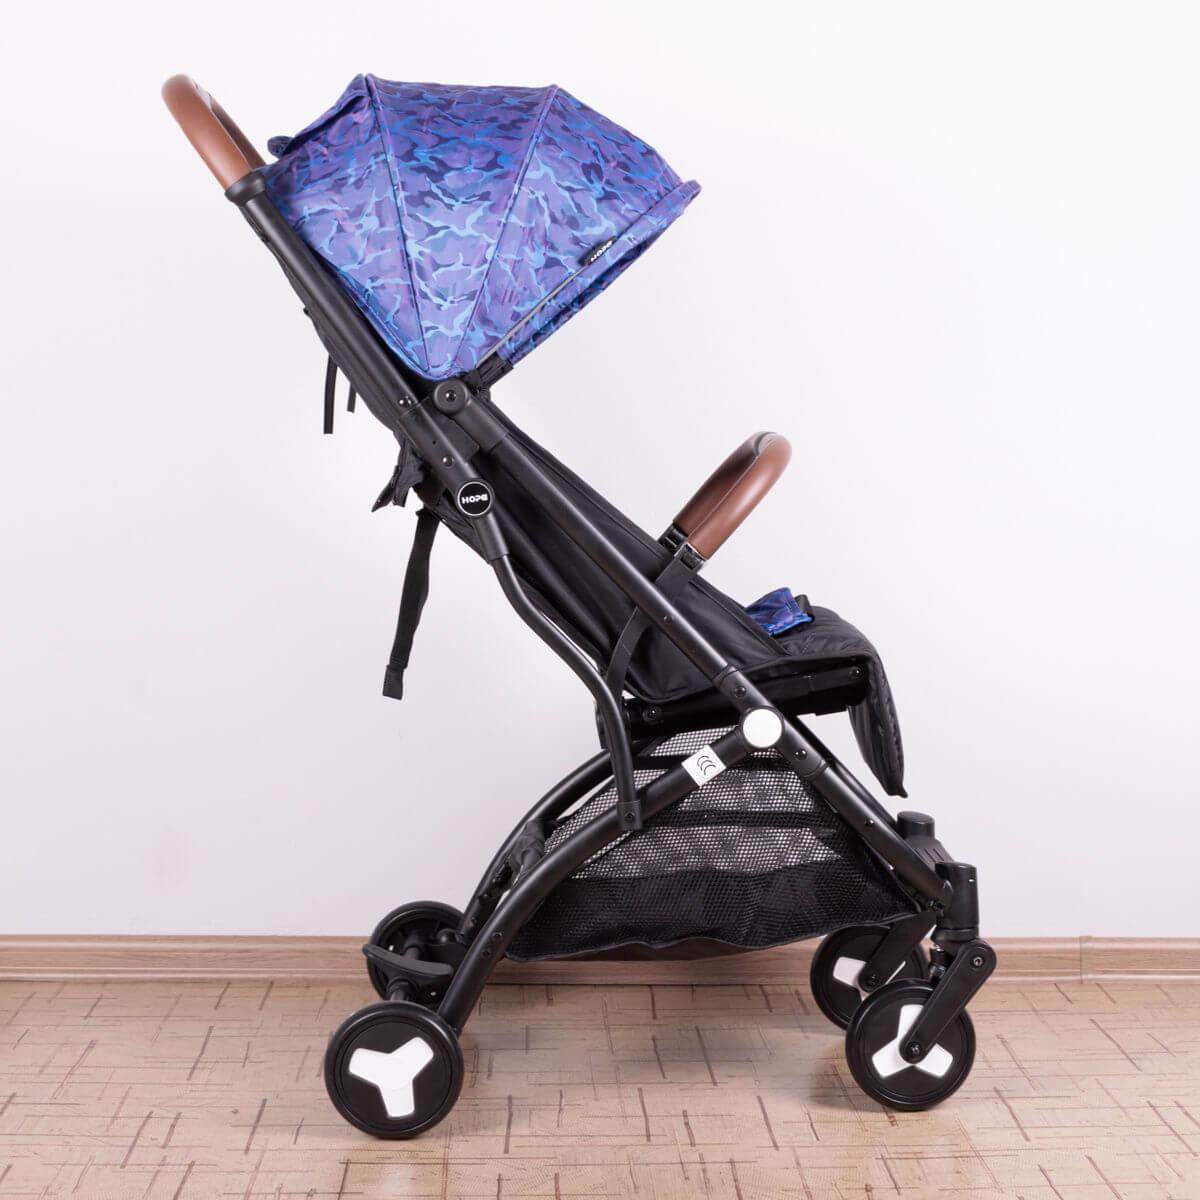 Прогулочная коляска Hope HP-711 цвета в ассортименте